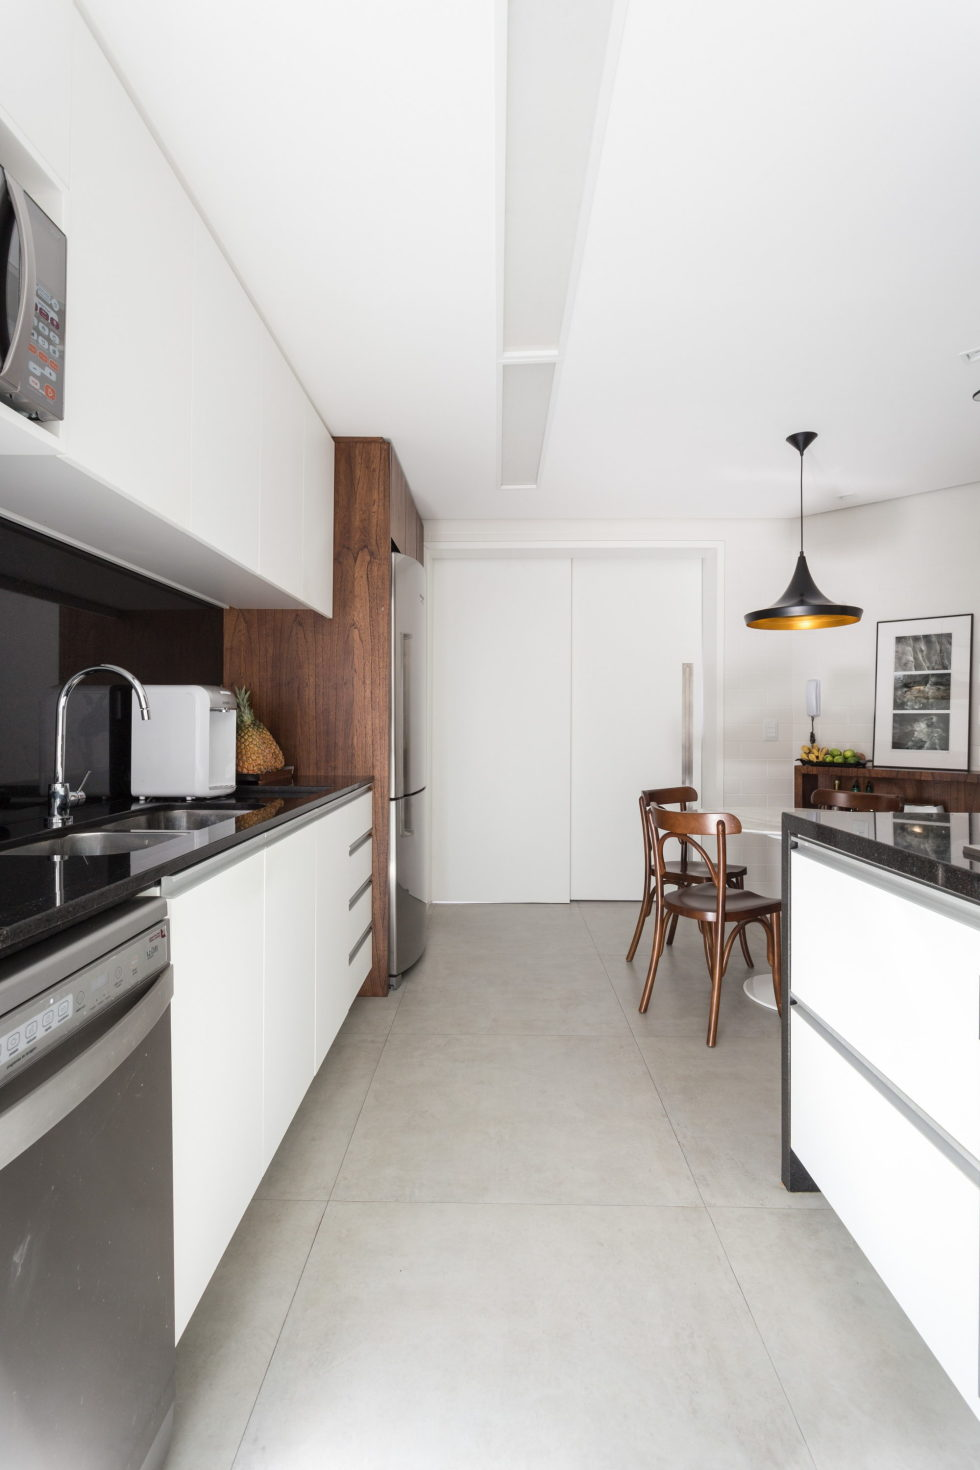 The PLAZA Apartments The Ambidestro Bureau Project 11